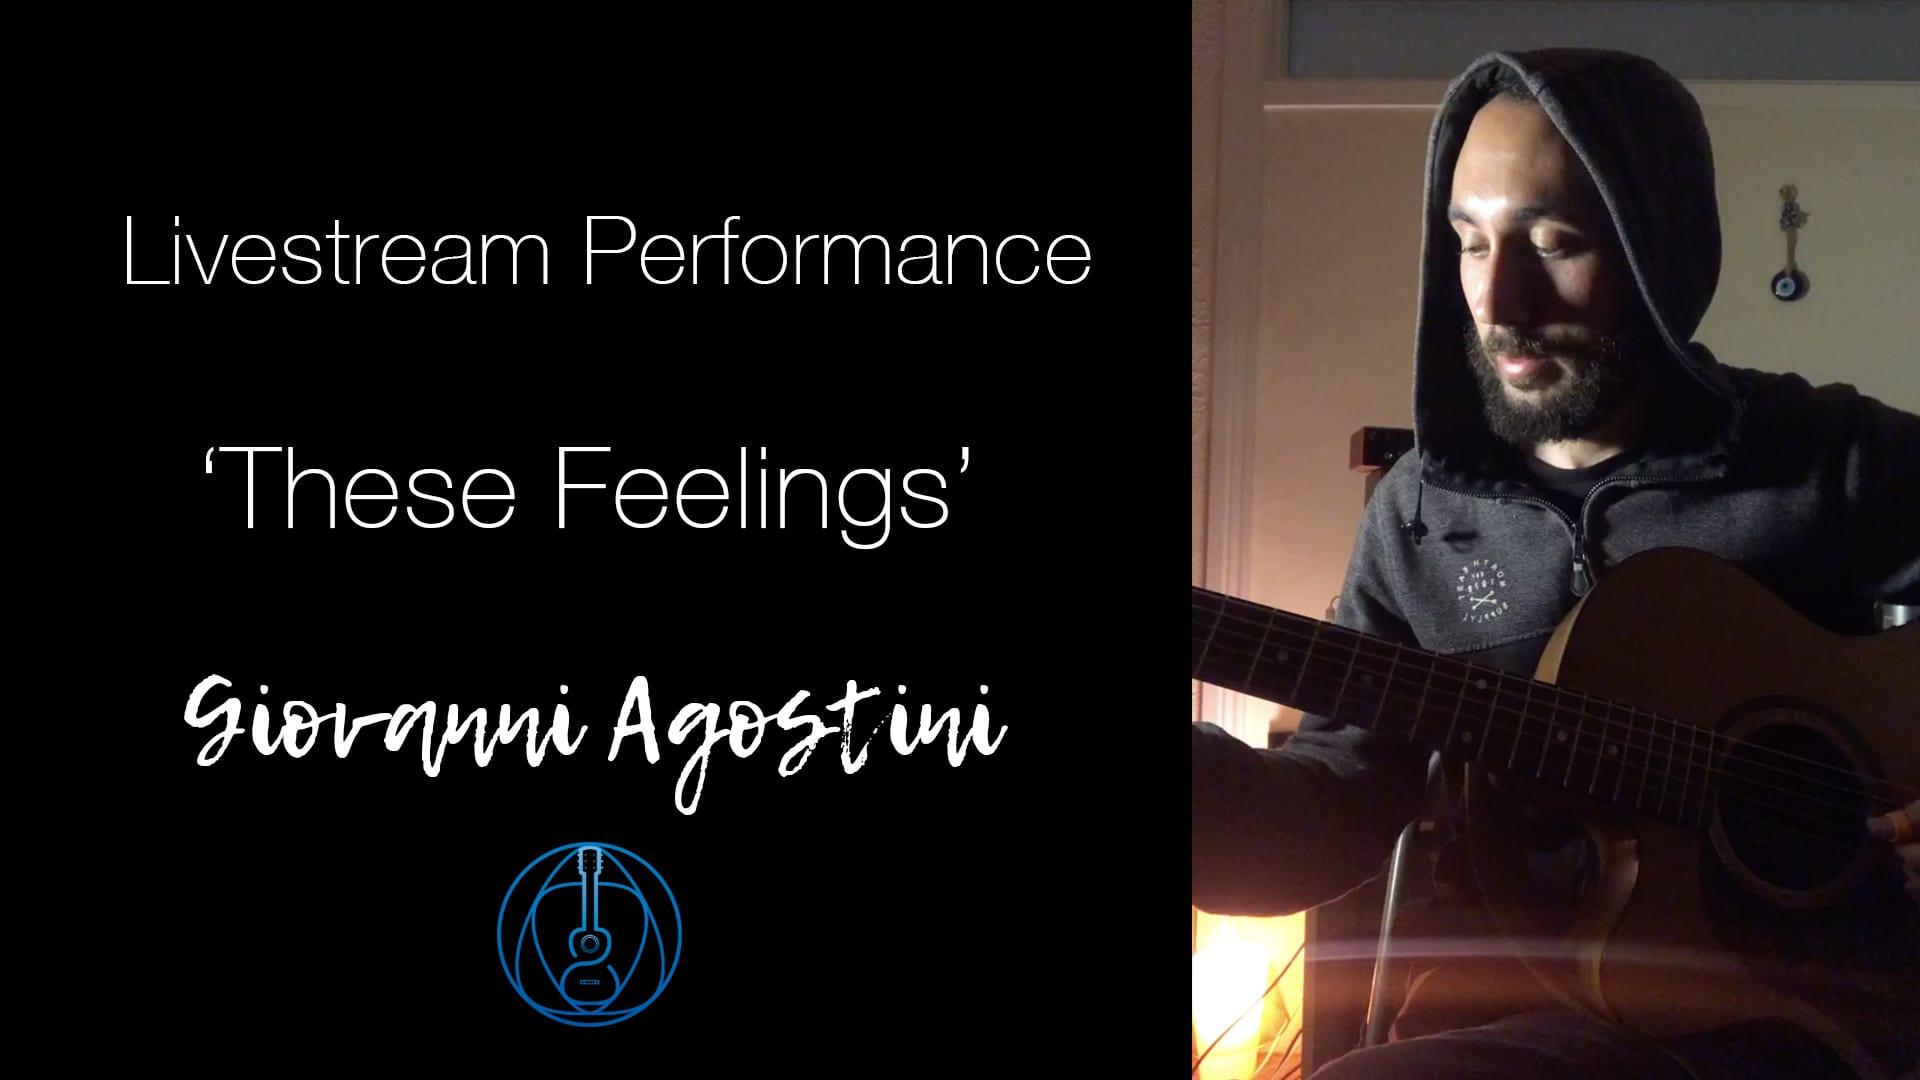 These Feelings | 432hz | Livestream Performance